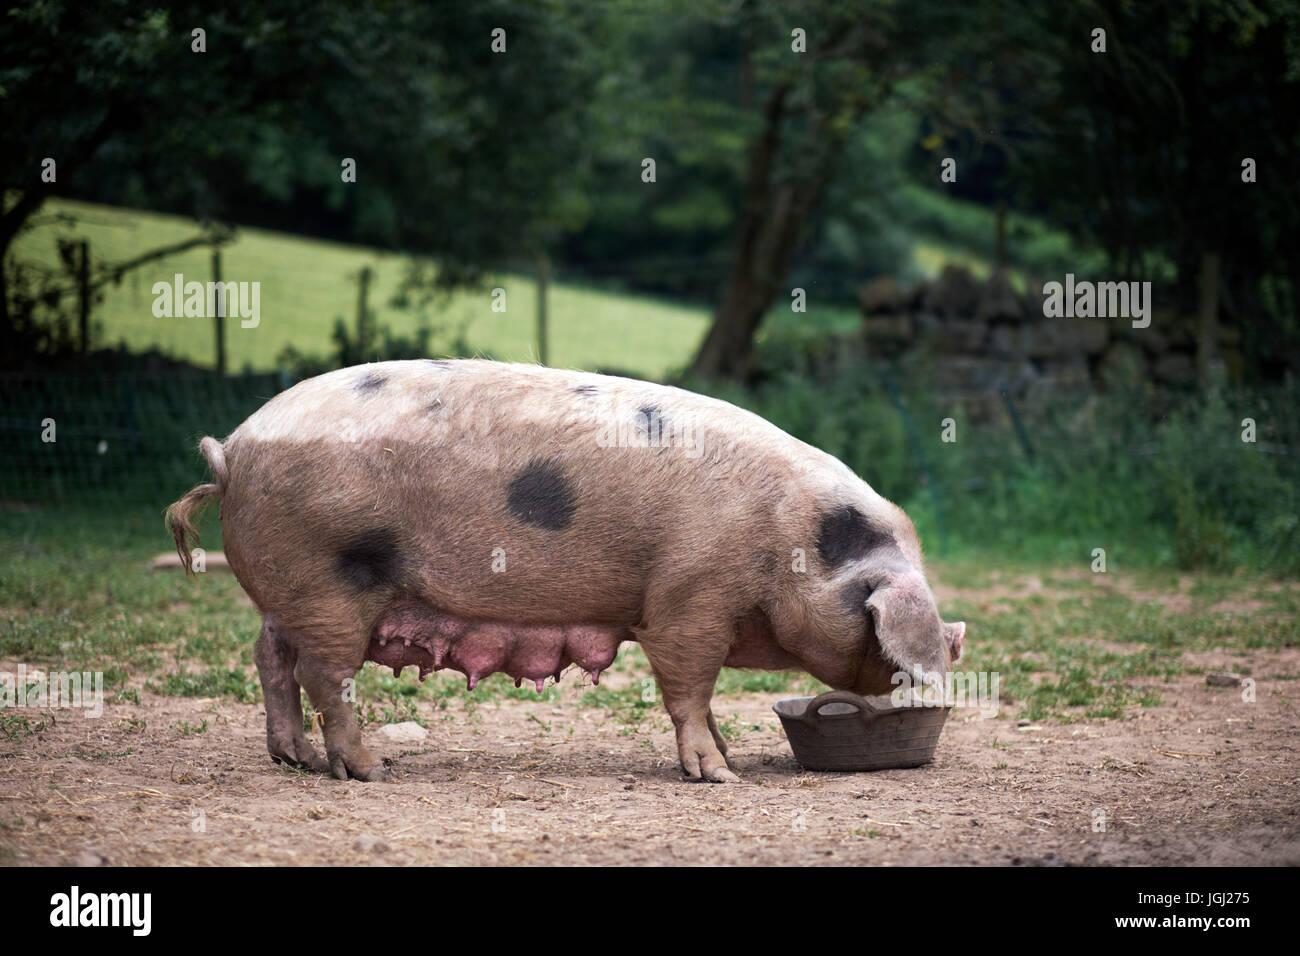 Piglet (Sus scrofa domestica) at an organic farm - Stock Image